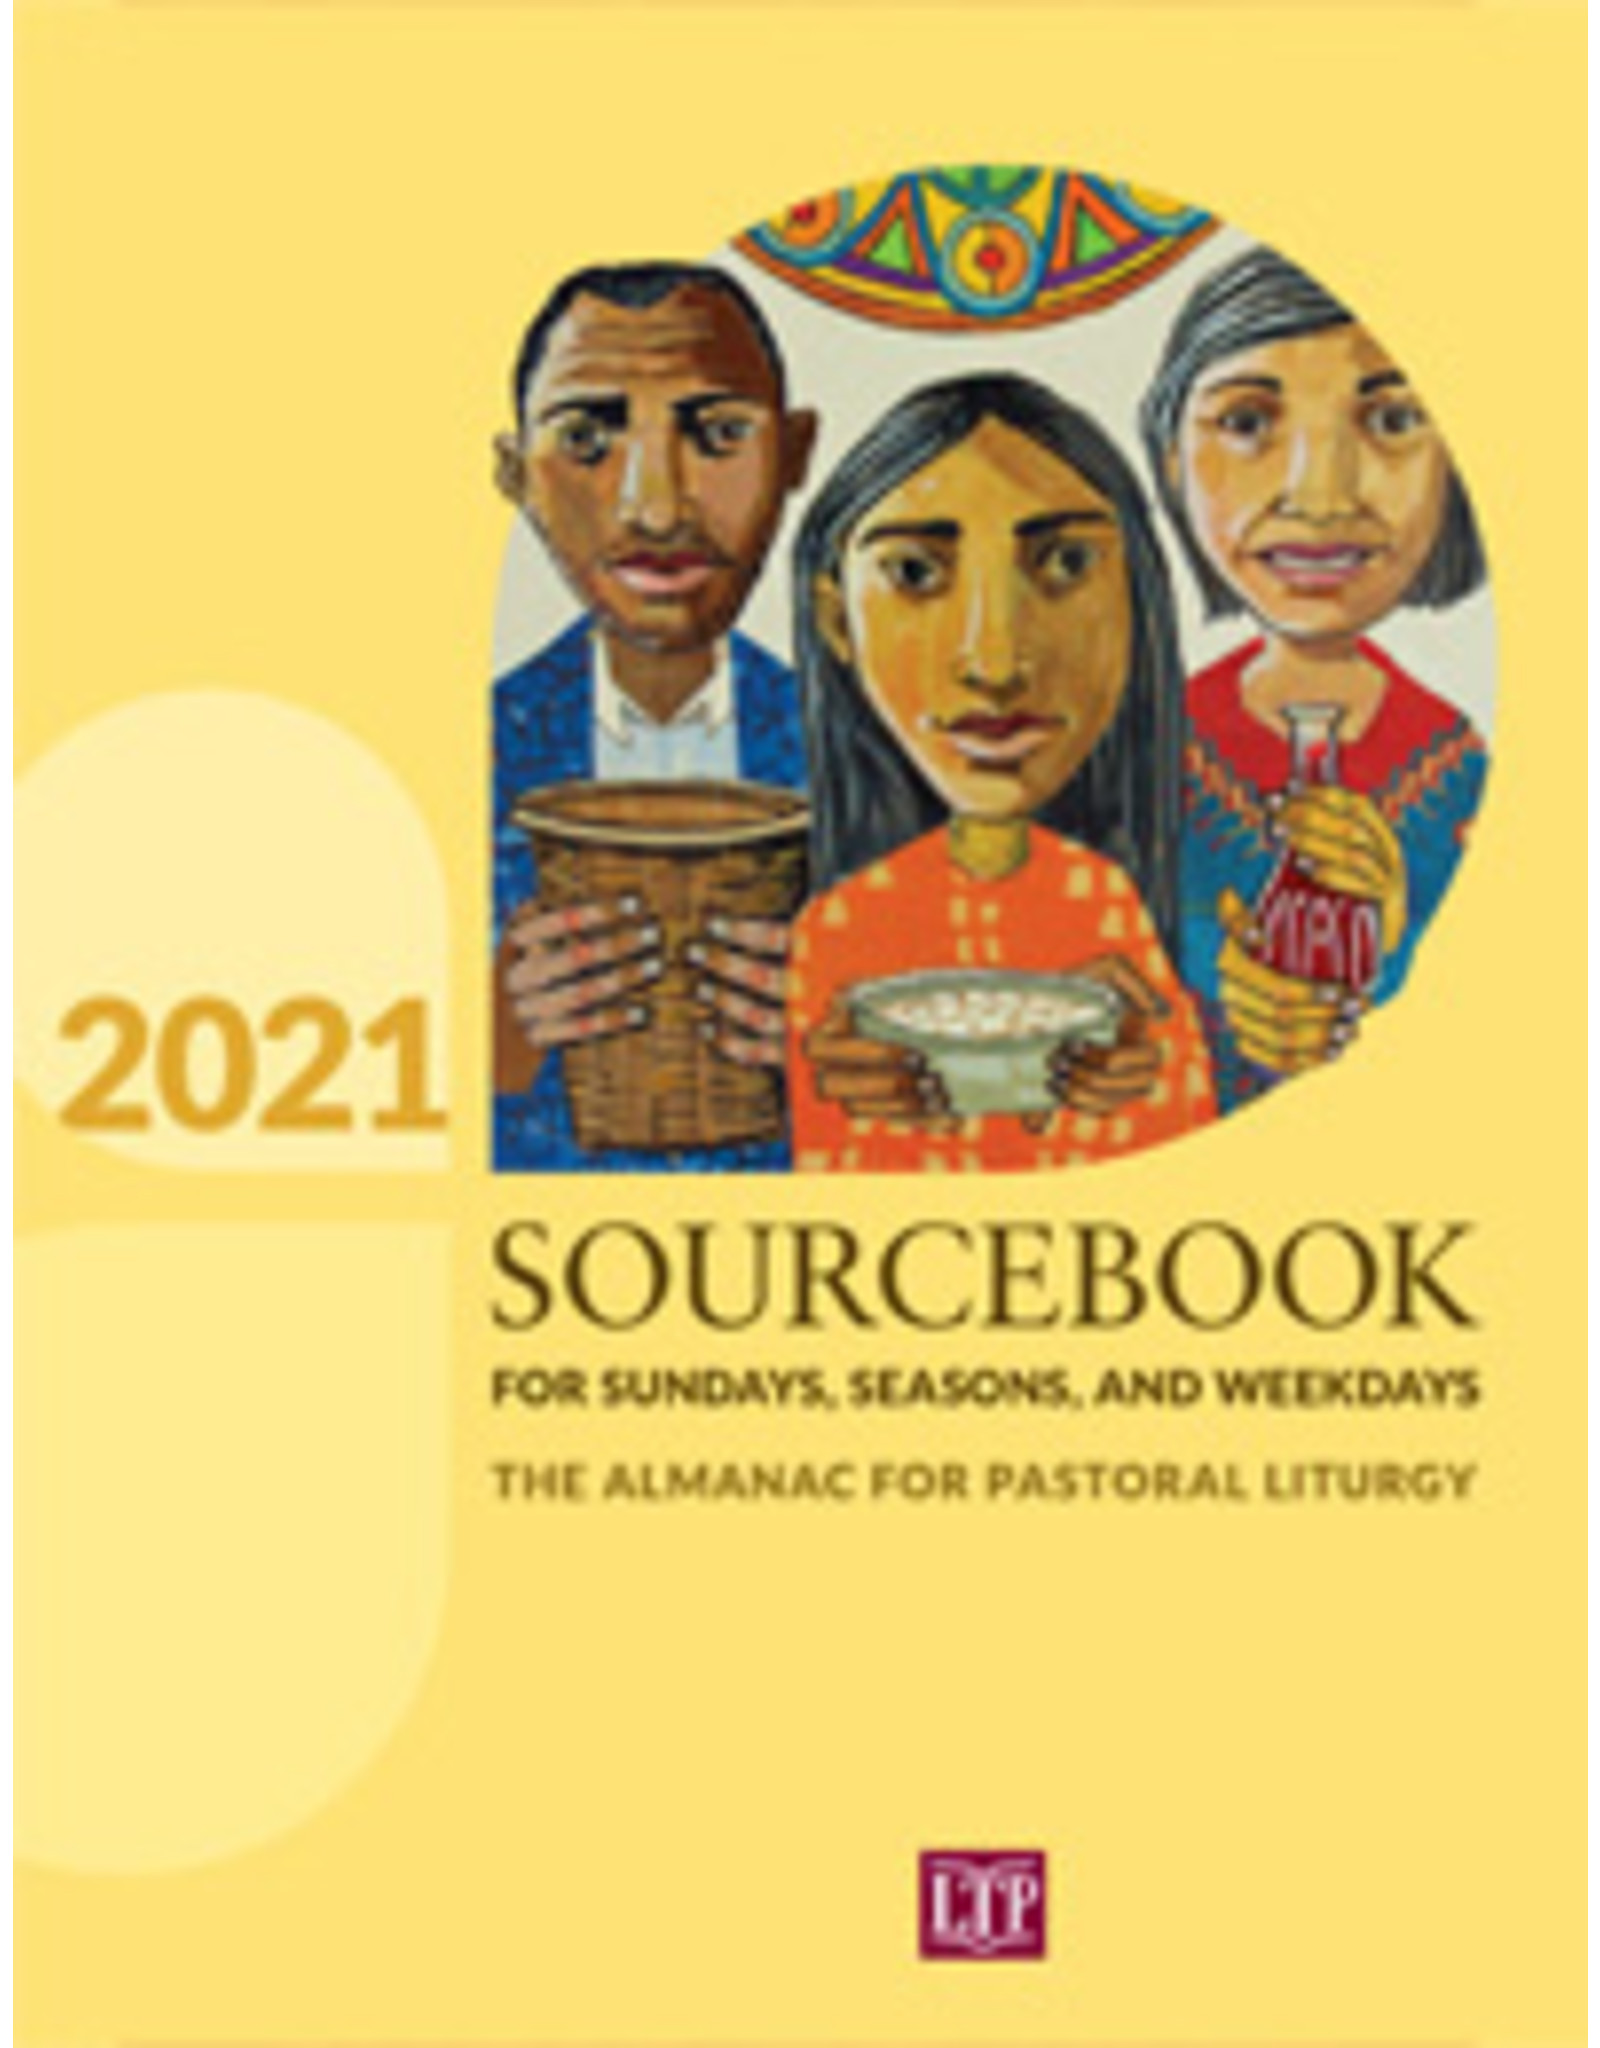 2021 SOURCEBOOK SUNDAYS,SEASONS,